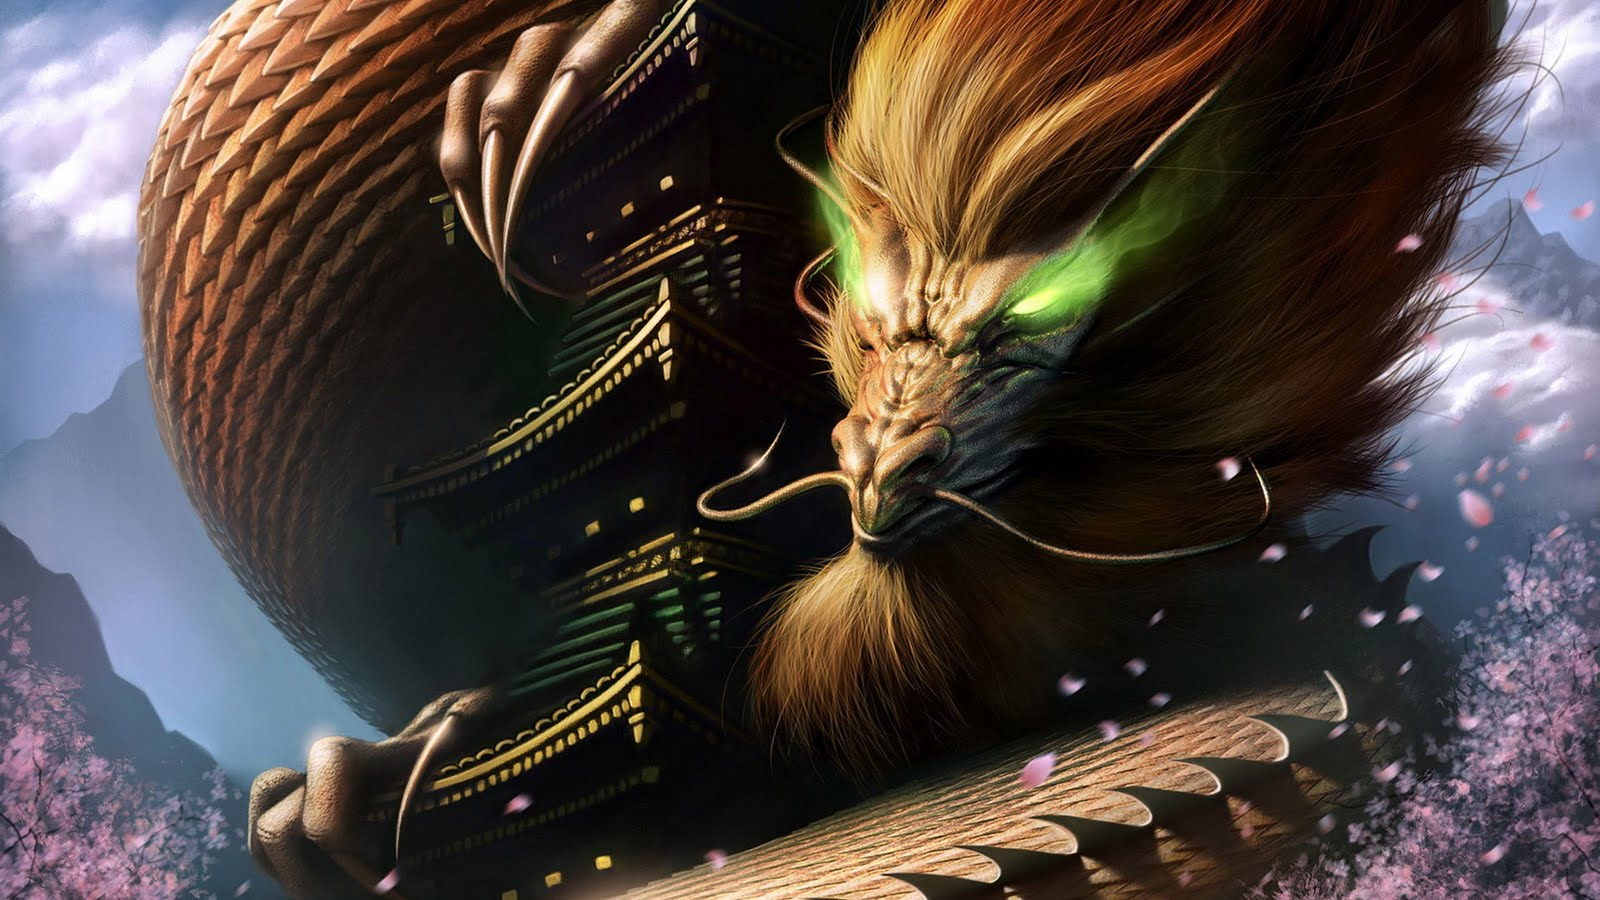 http://4.bp.blogspot.com/-ZDzxjjaWqrs/Tm2zrHVHv5I/AAAAAAAAAoM/C3CIHzAecro/s1600/Dragon_King-Fantasy_CG_illustration_wallpaper_1920x1080.jpg